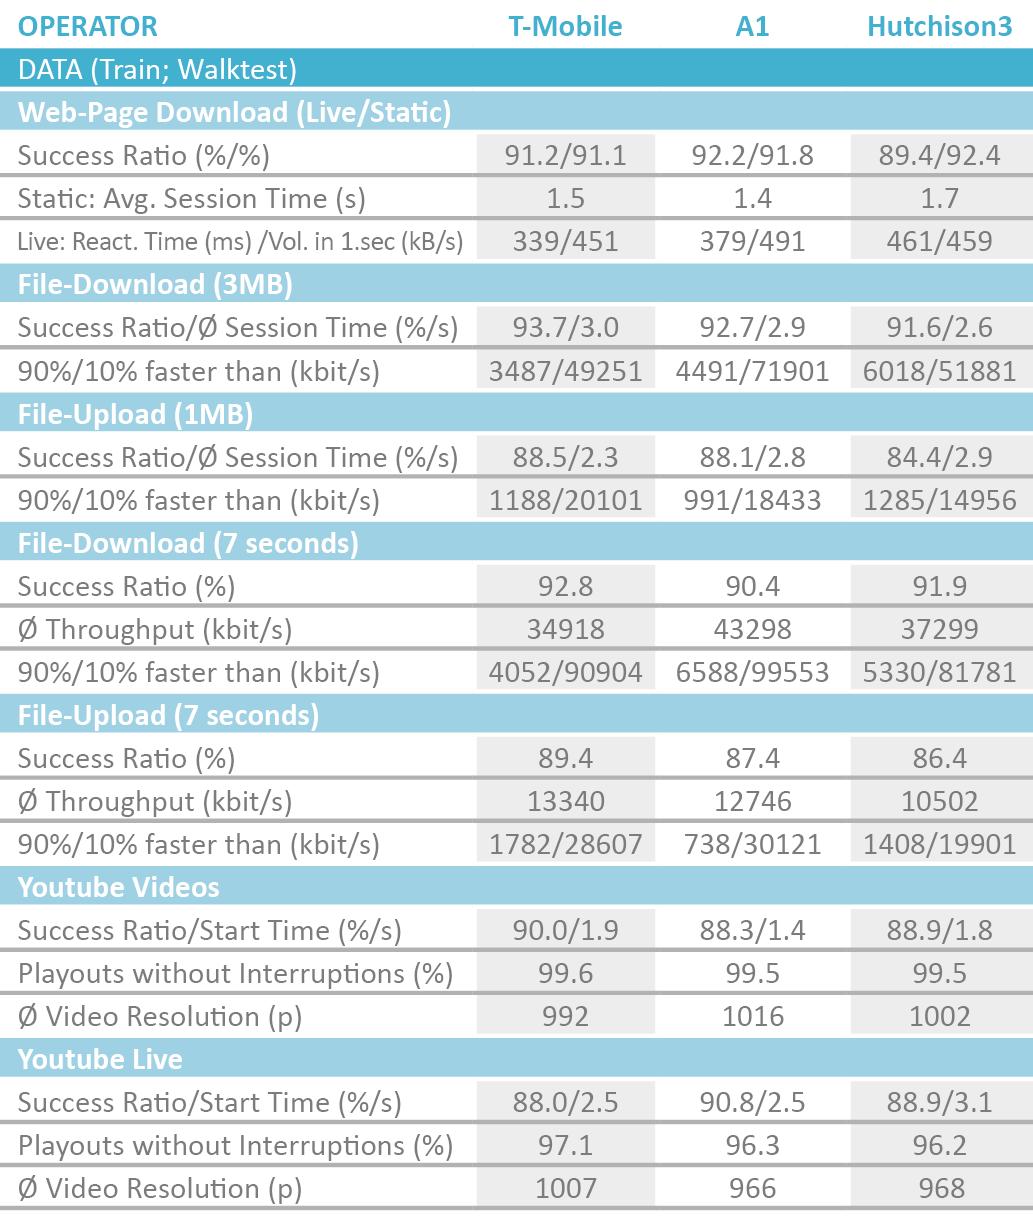 AT_Tabelle_DatenBahnWalktest2018_englisch.png